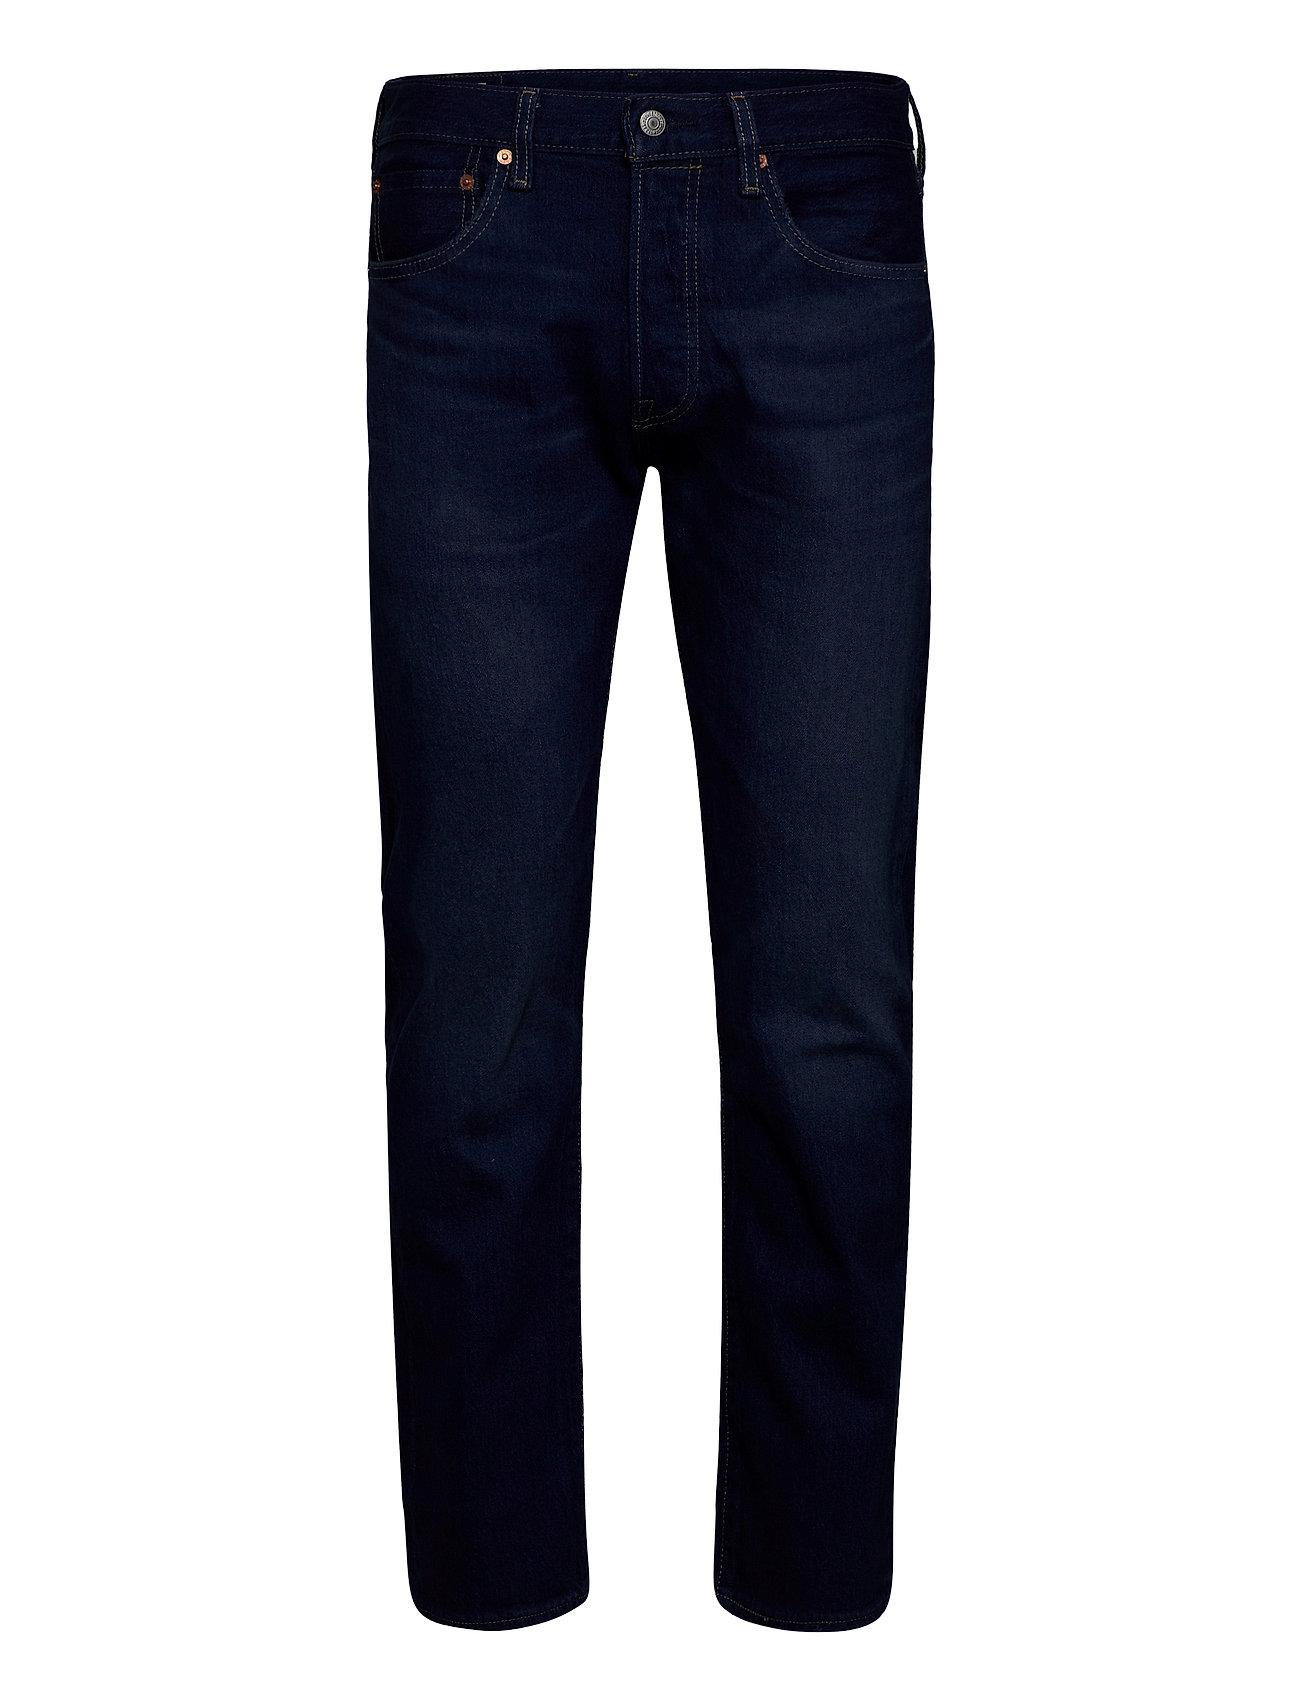 Image of 501 Levisoriginal Miami Sky Od Slim Jeans Blå LEVI´S Men (3441400015)